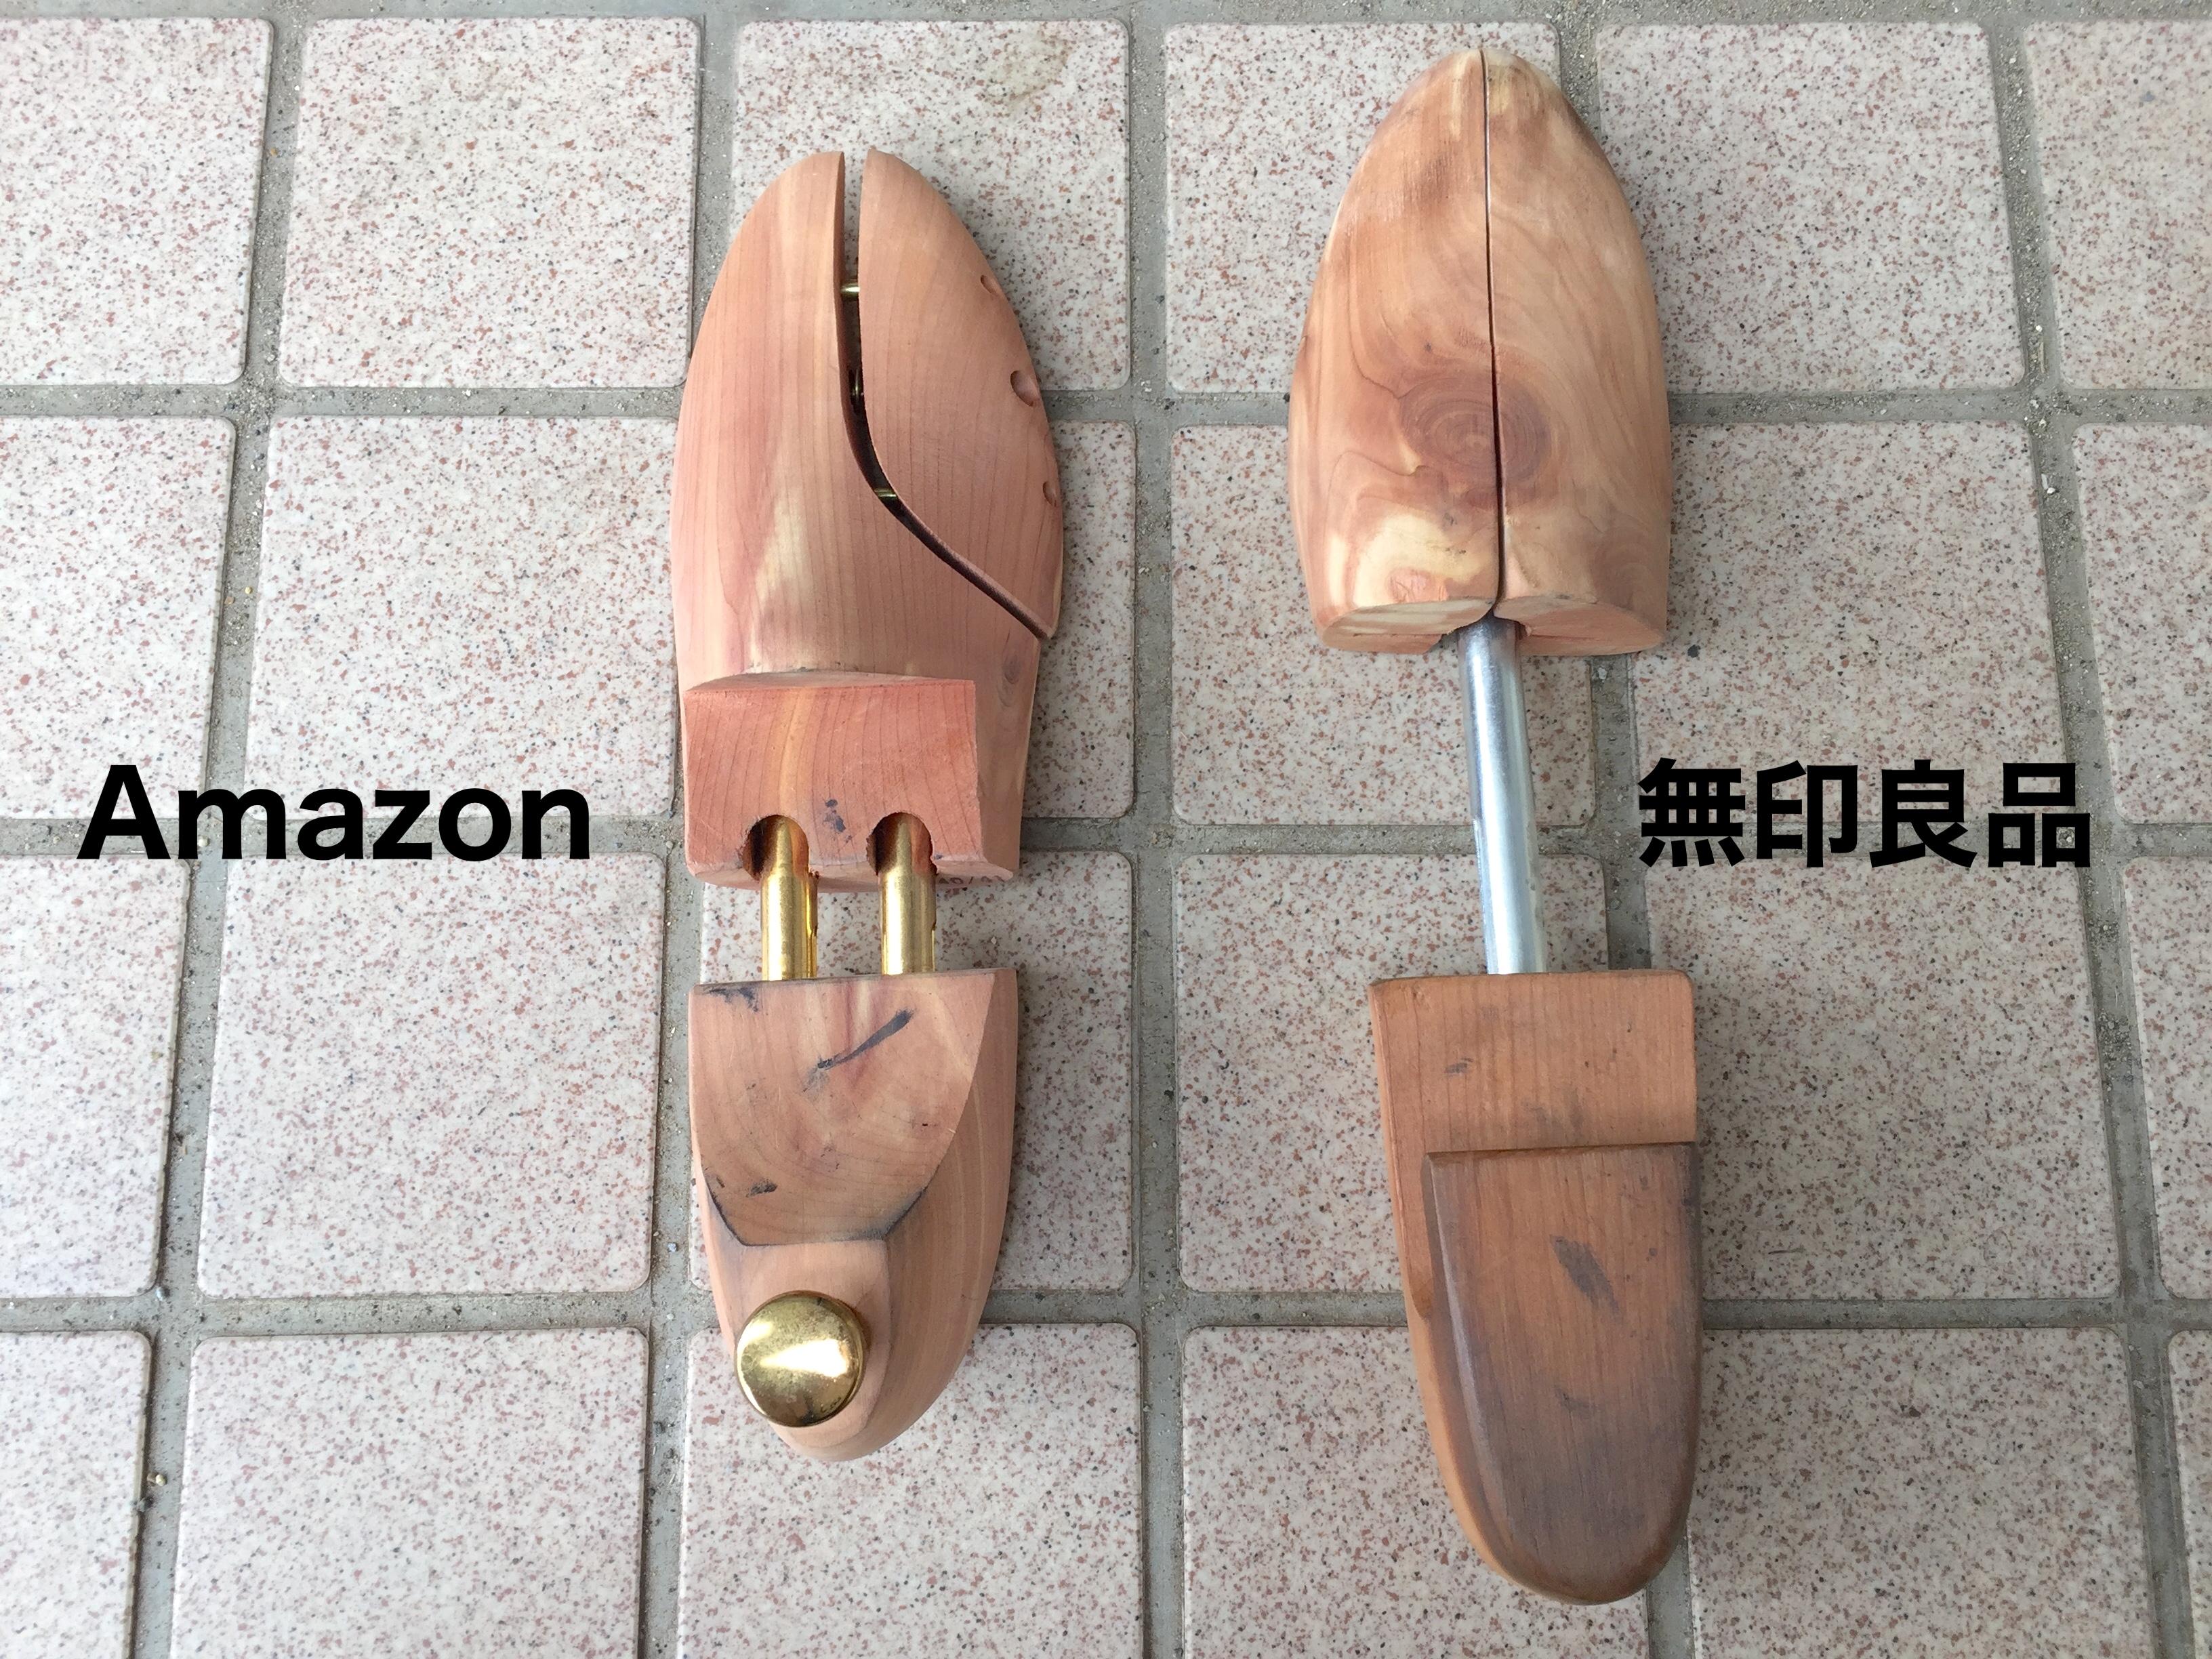 Amazonと無印良品のシューキーパー(シューツリー)